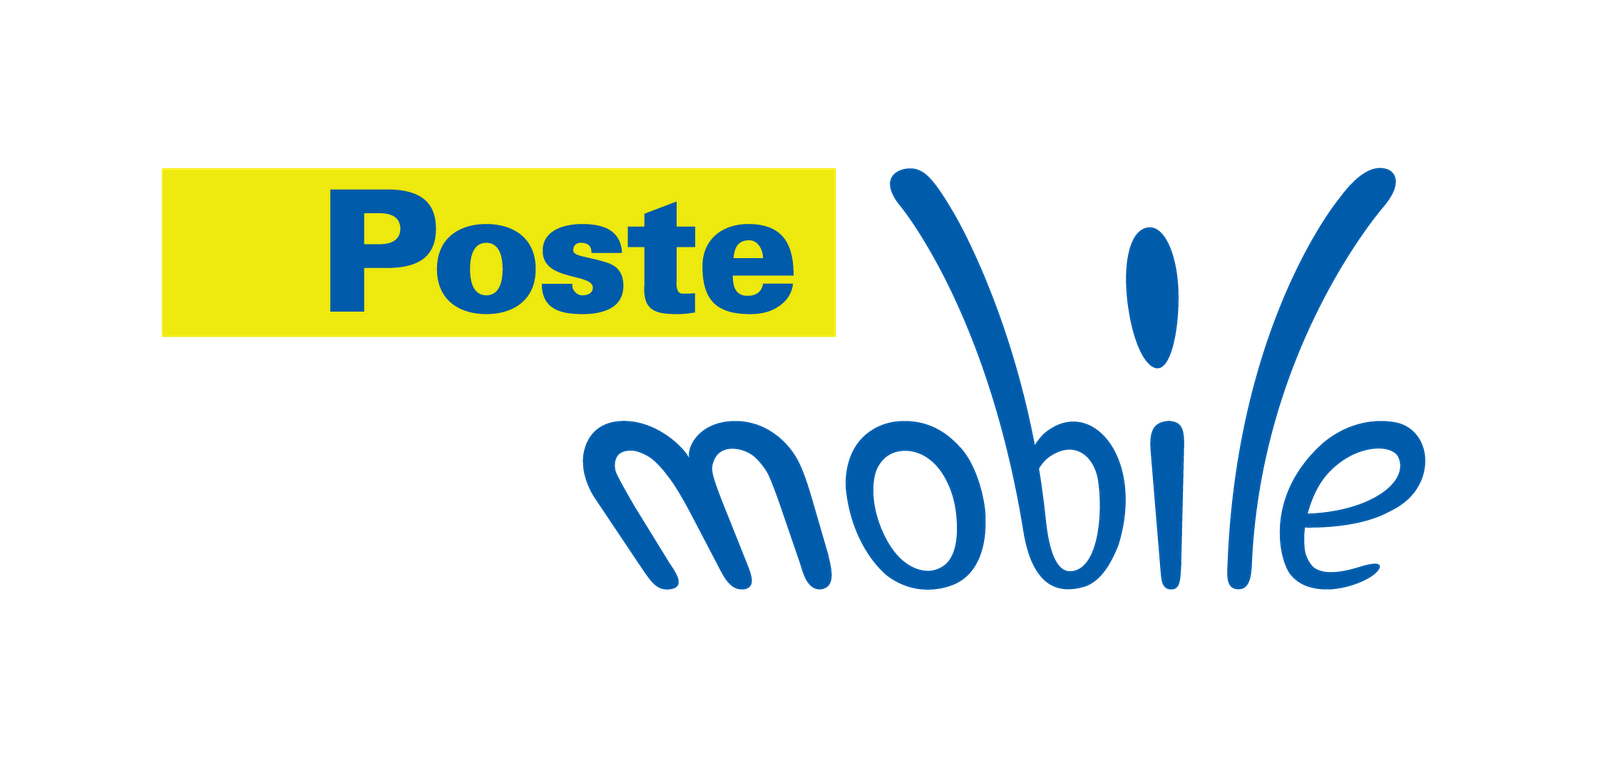 Disdetta Poste Mobile